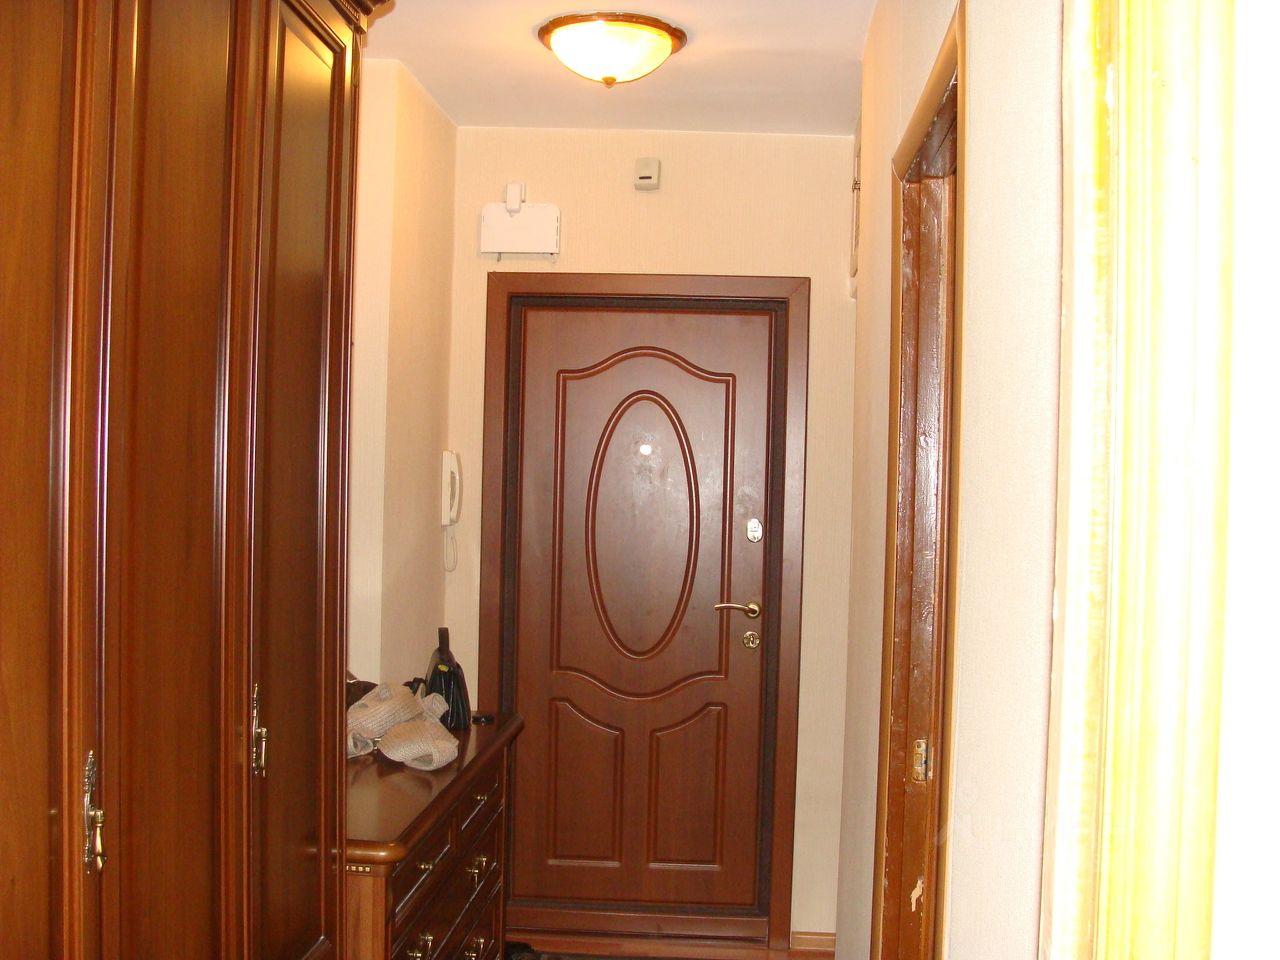 продам трехкомнатную квартиру город Москва, метро Бибирево, Путевой проезд, д. 26А